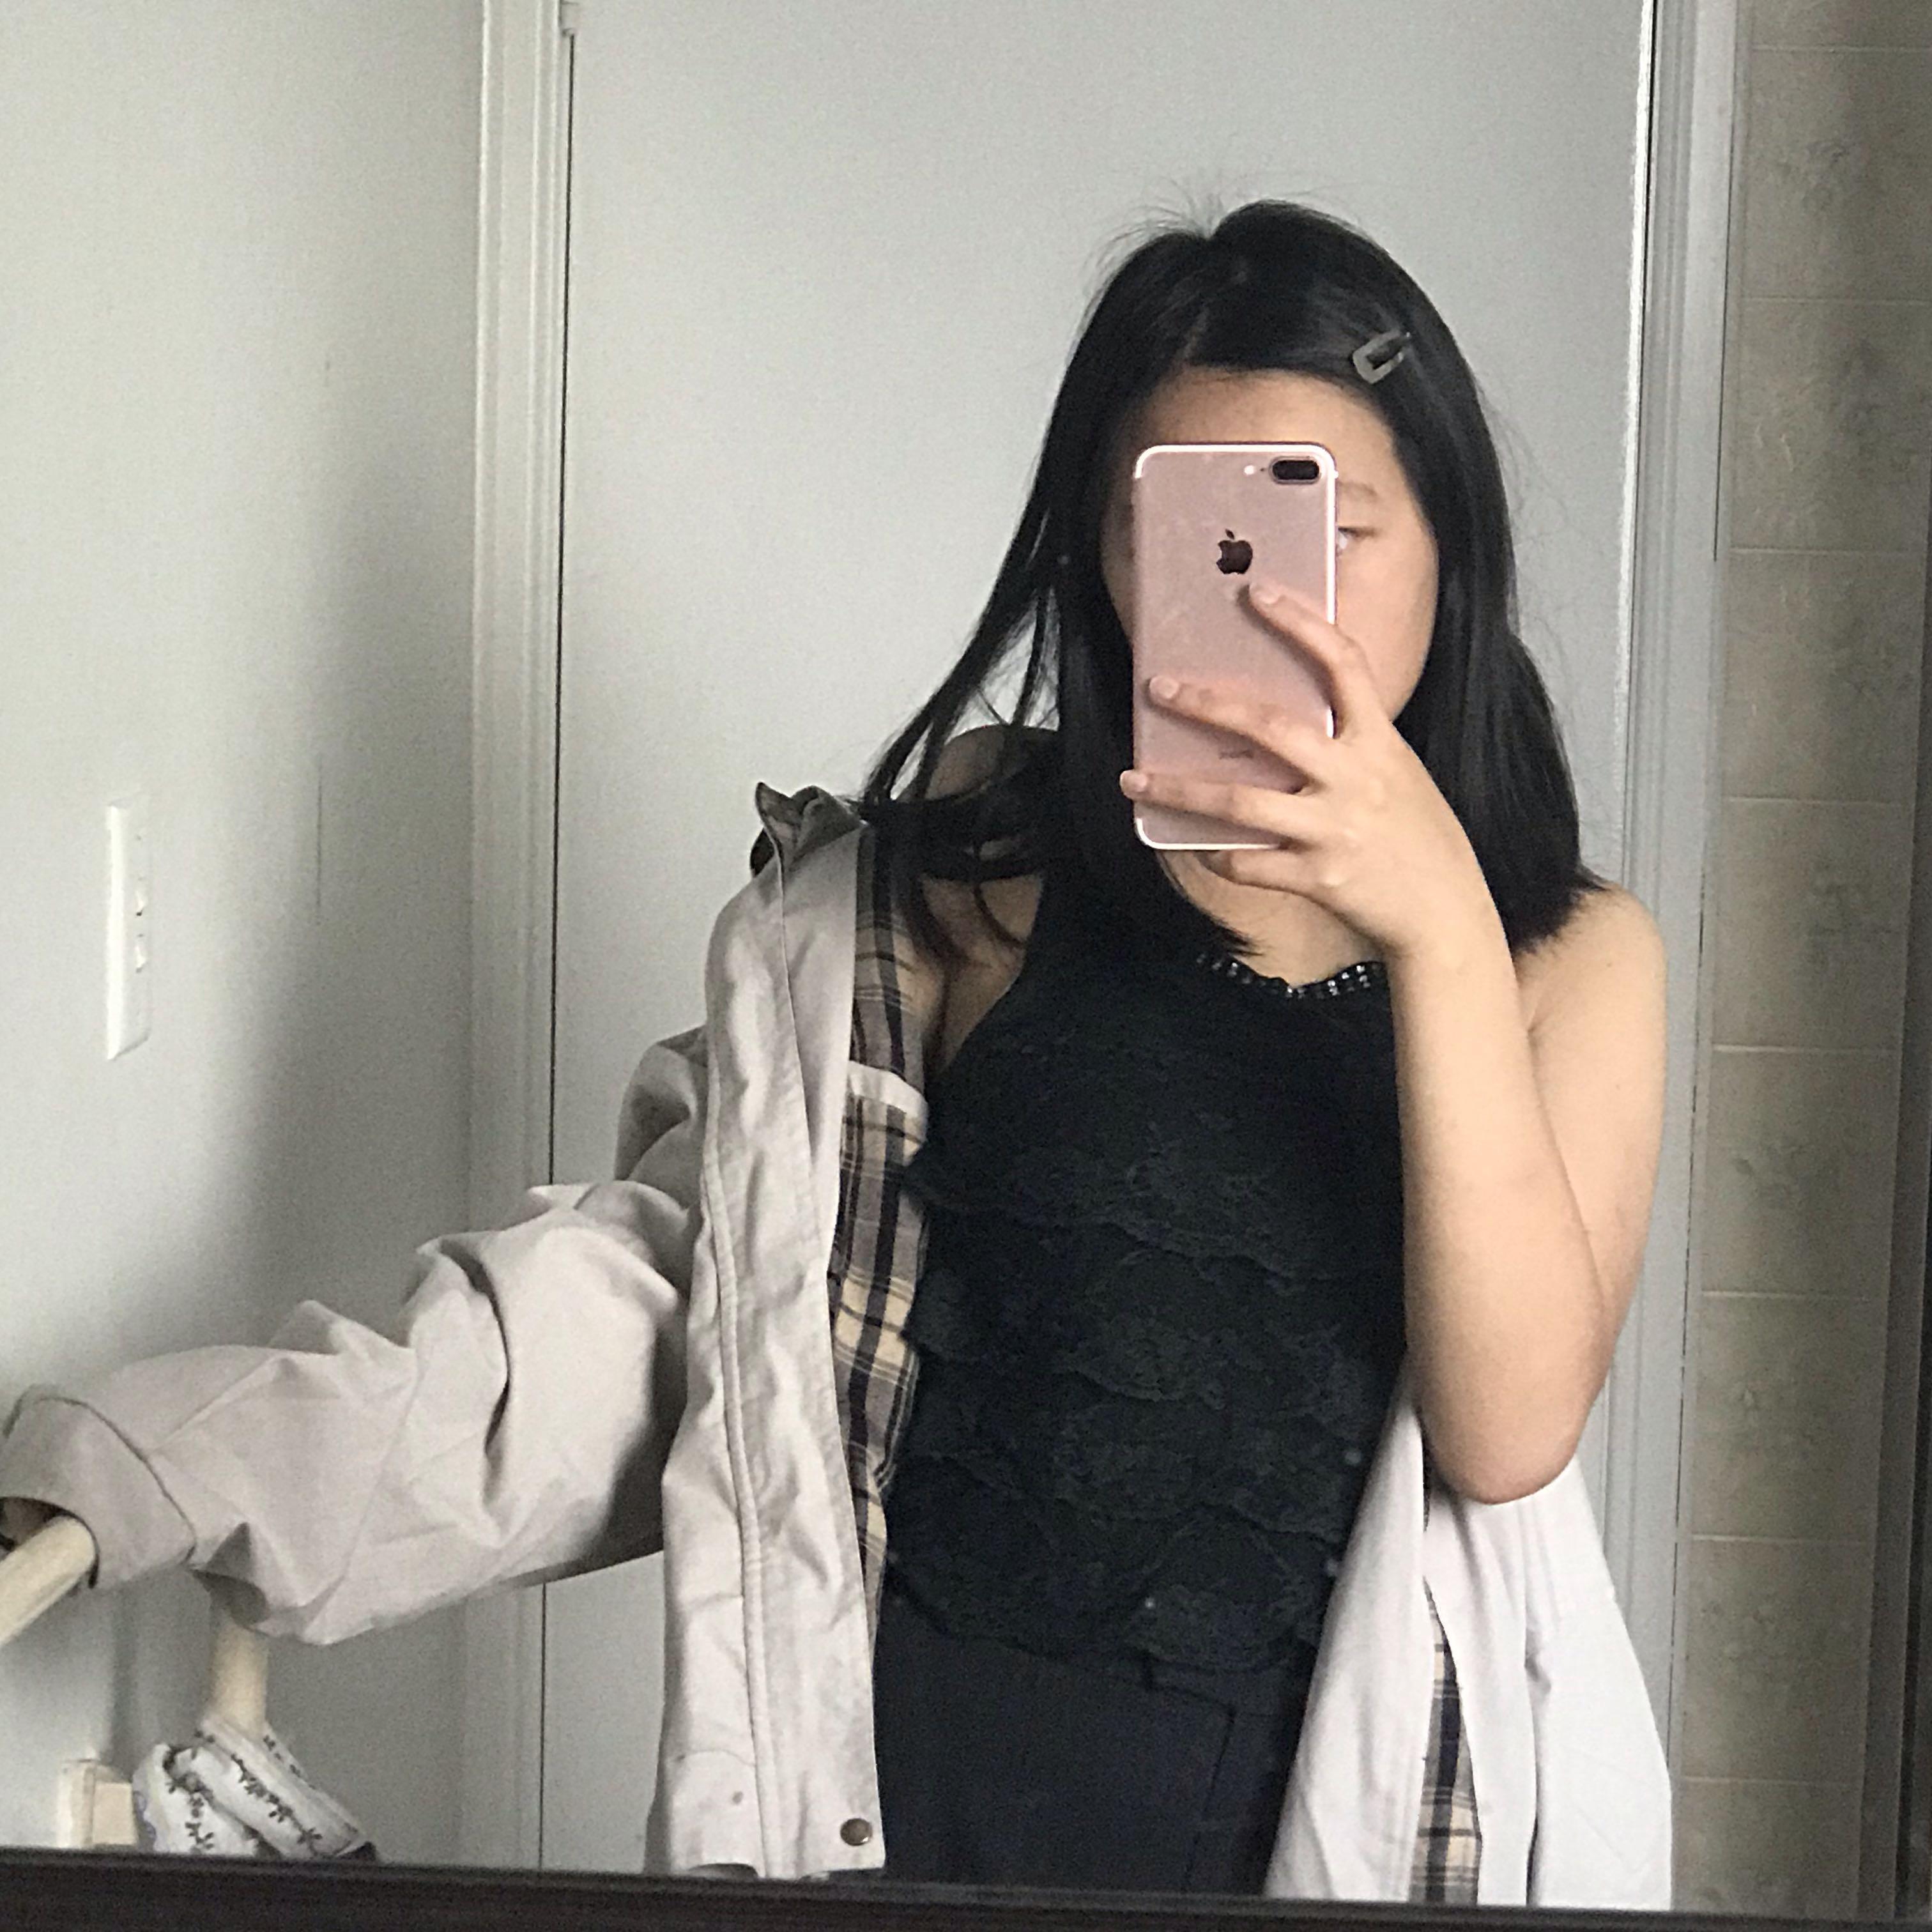 Black Sleeveless Top - Lace